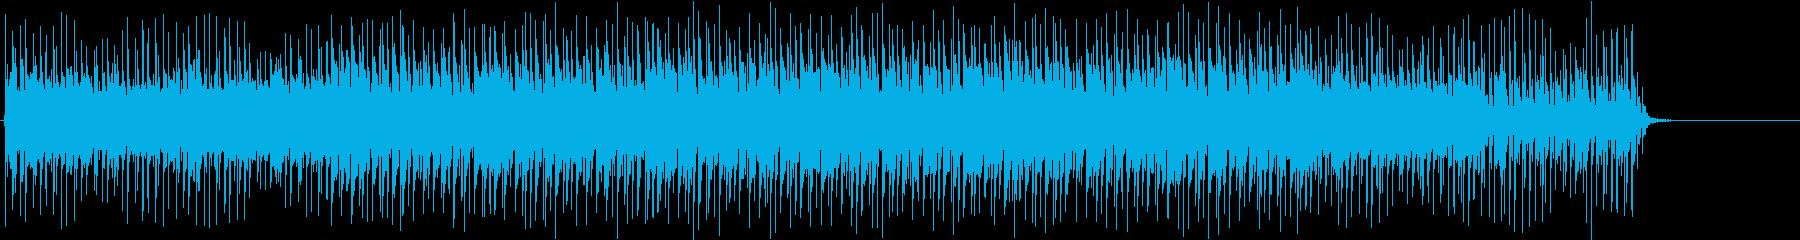 【CM・ニュース】テクノBGM3の再生済みの波形